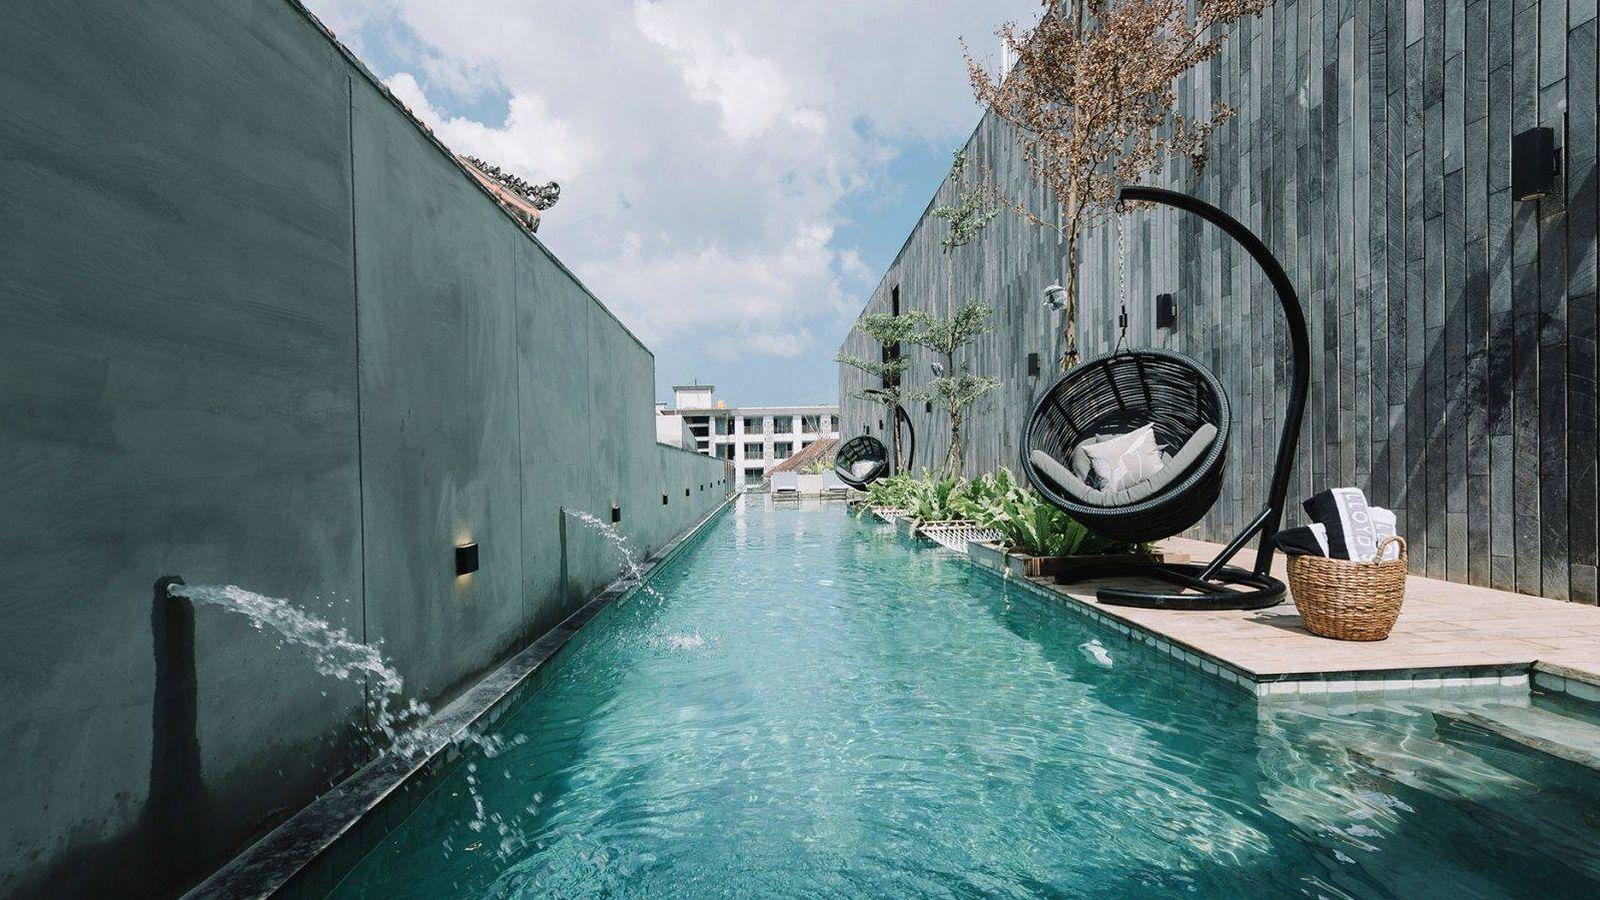 Foto: Rumbo al paraíso. (Lloyd's Inn Bali)